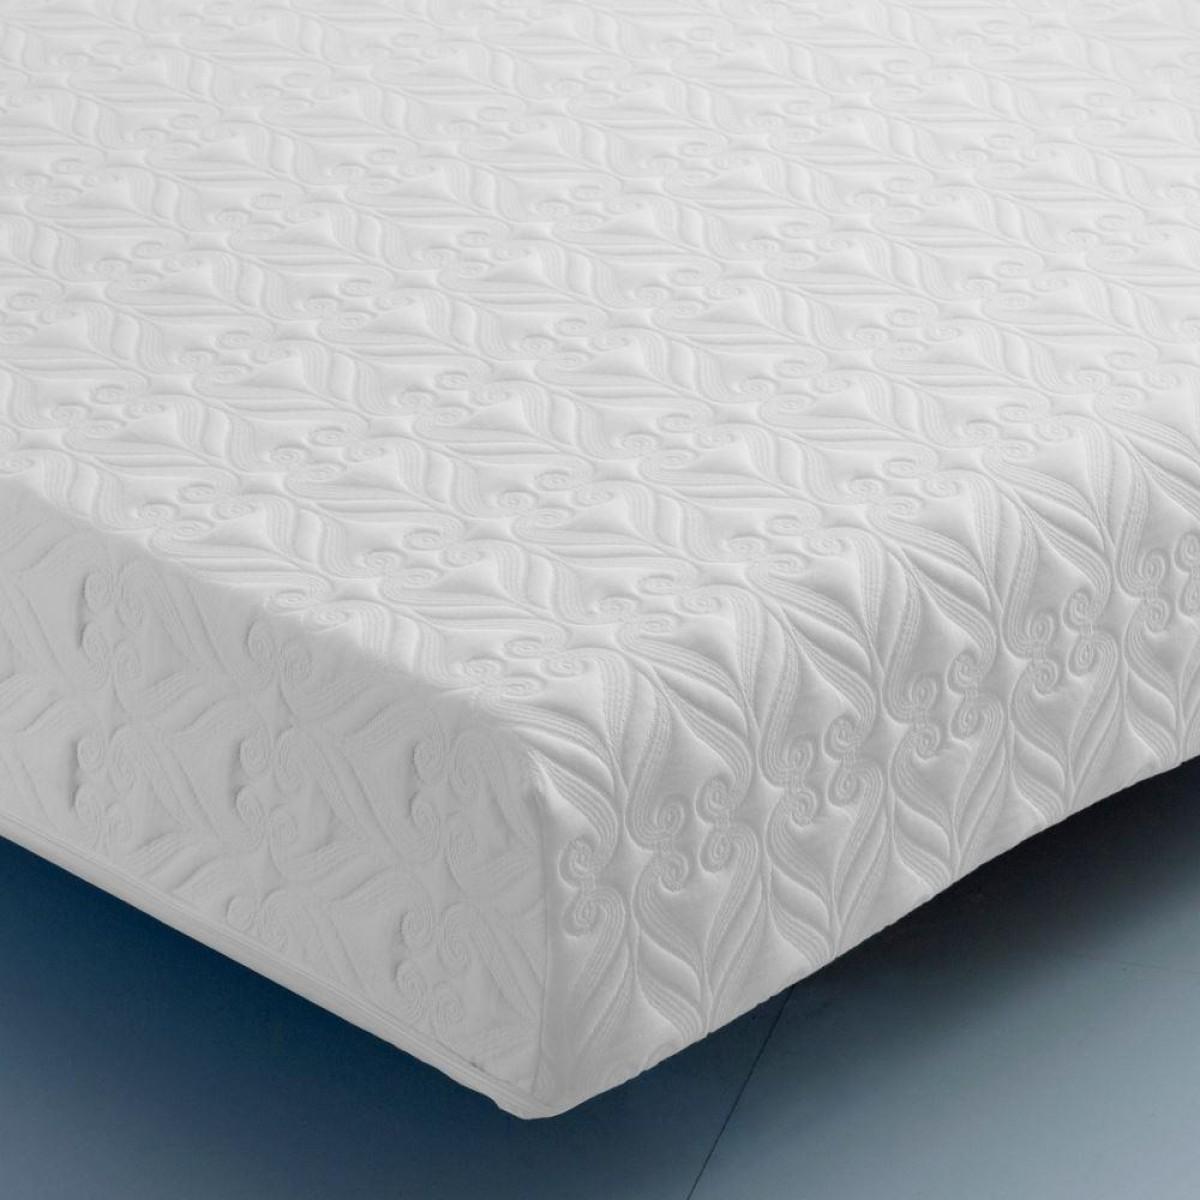 Fresh Wave Memory and Reflex Foam Orthopaedic Mattress